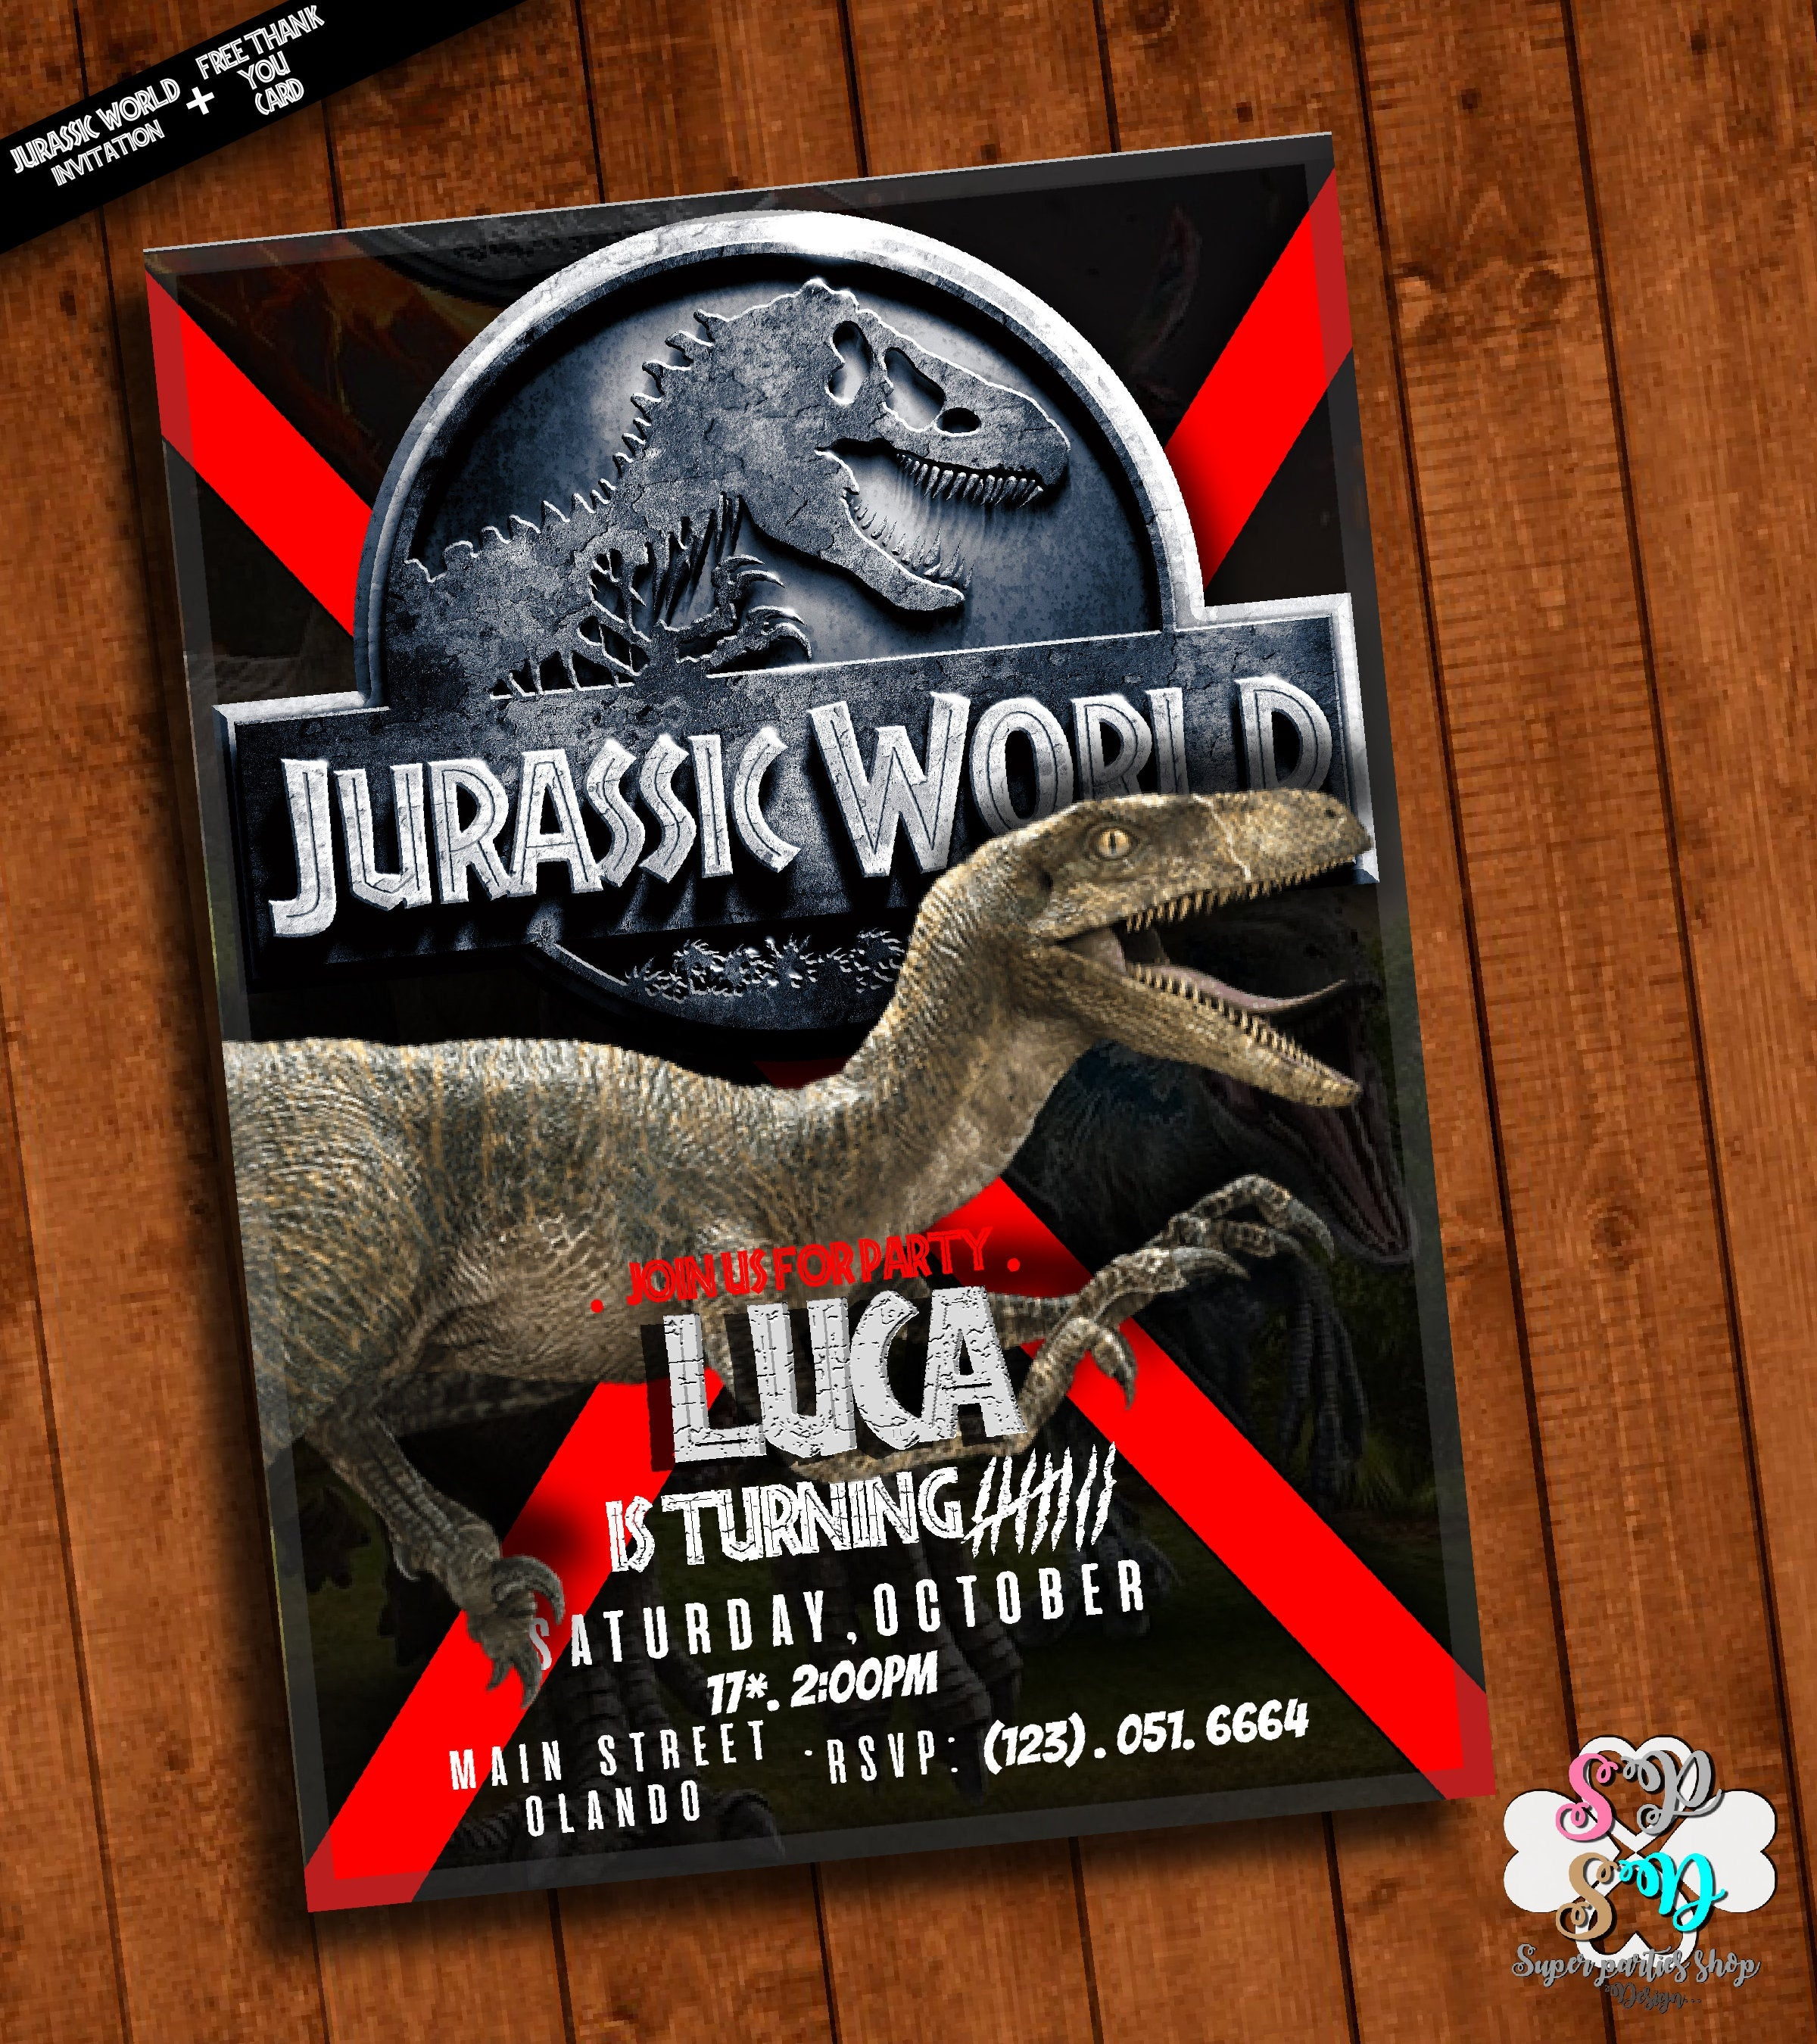 Jurassic World Invitation Printable With Free Thank You Card | Etsy - Free Printable Jurassic World Invitations